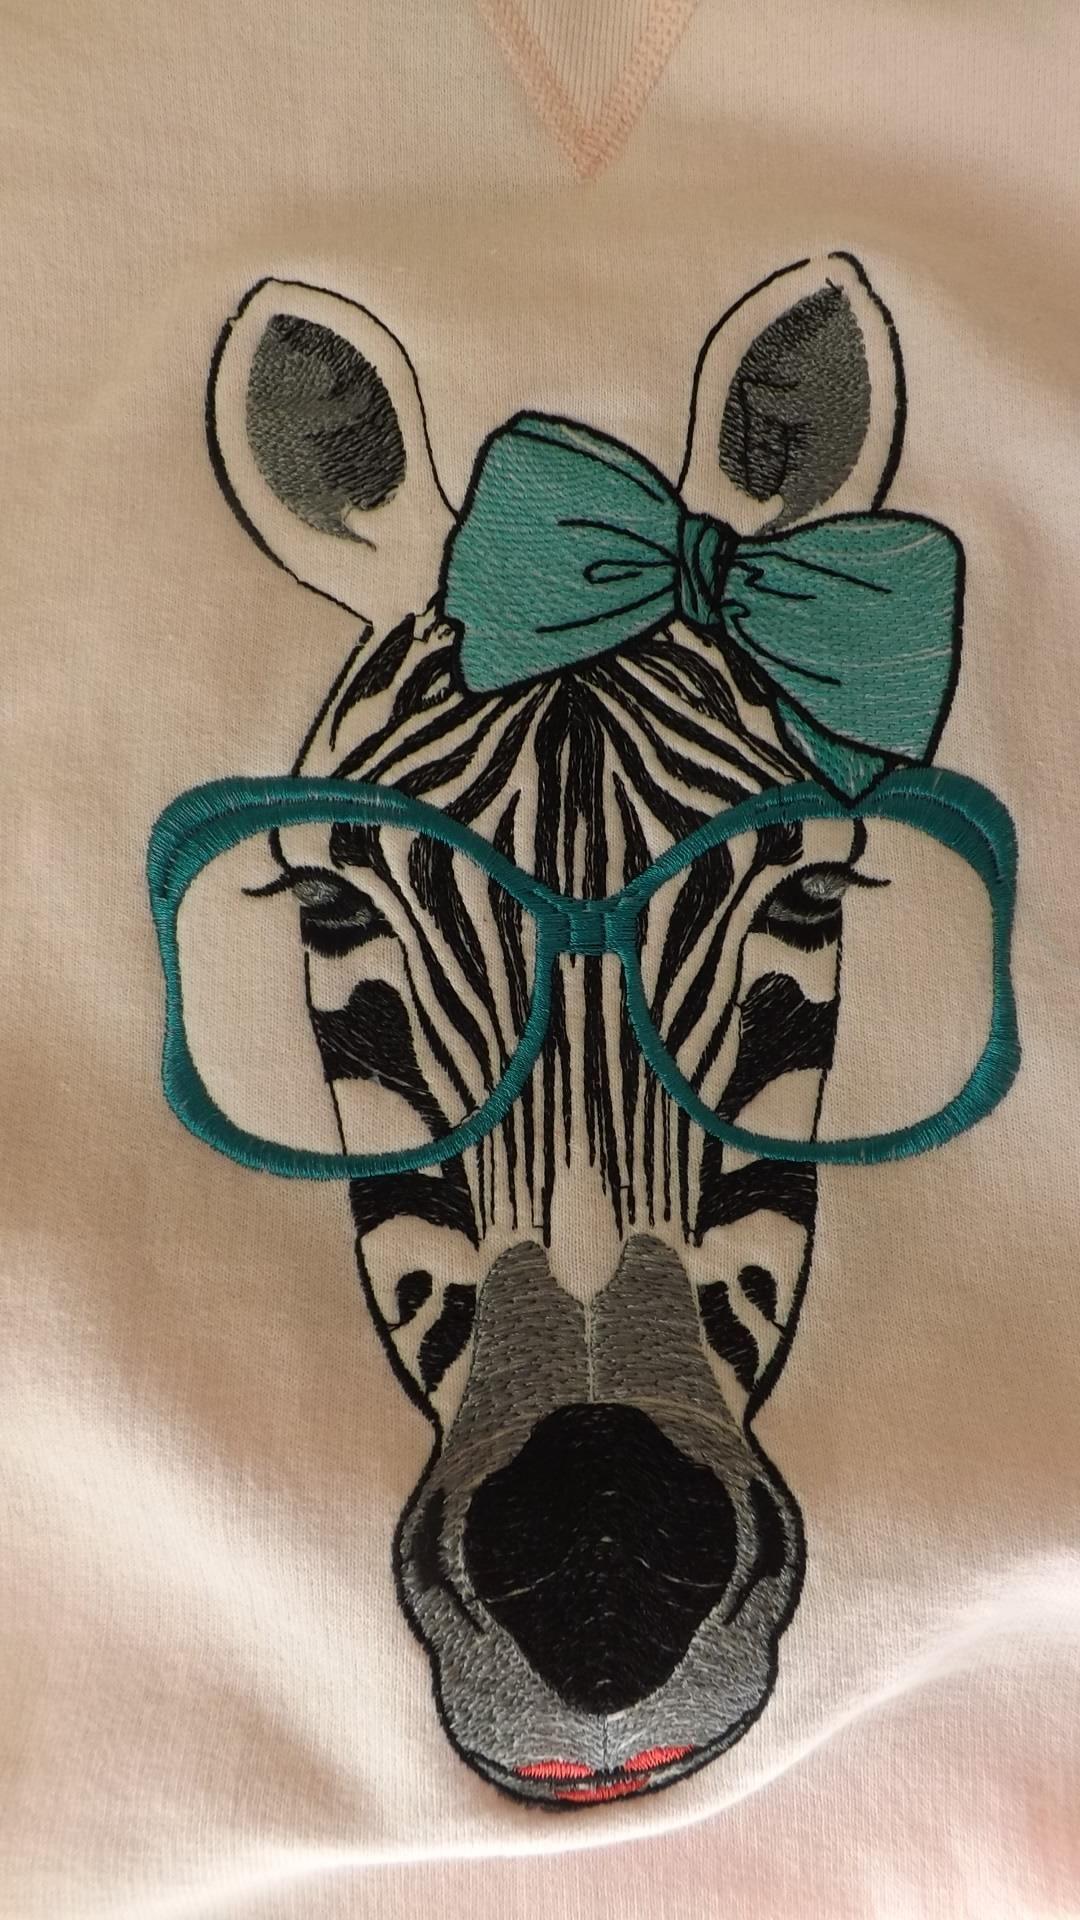 zebra_applique_free_embroidery_design.th | Divers | Pinterest ...